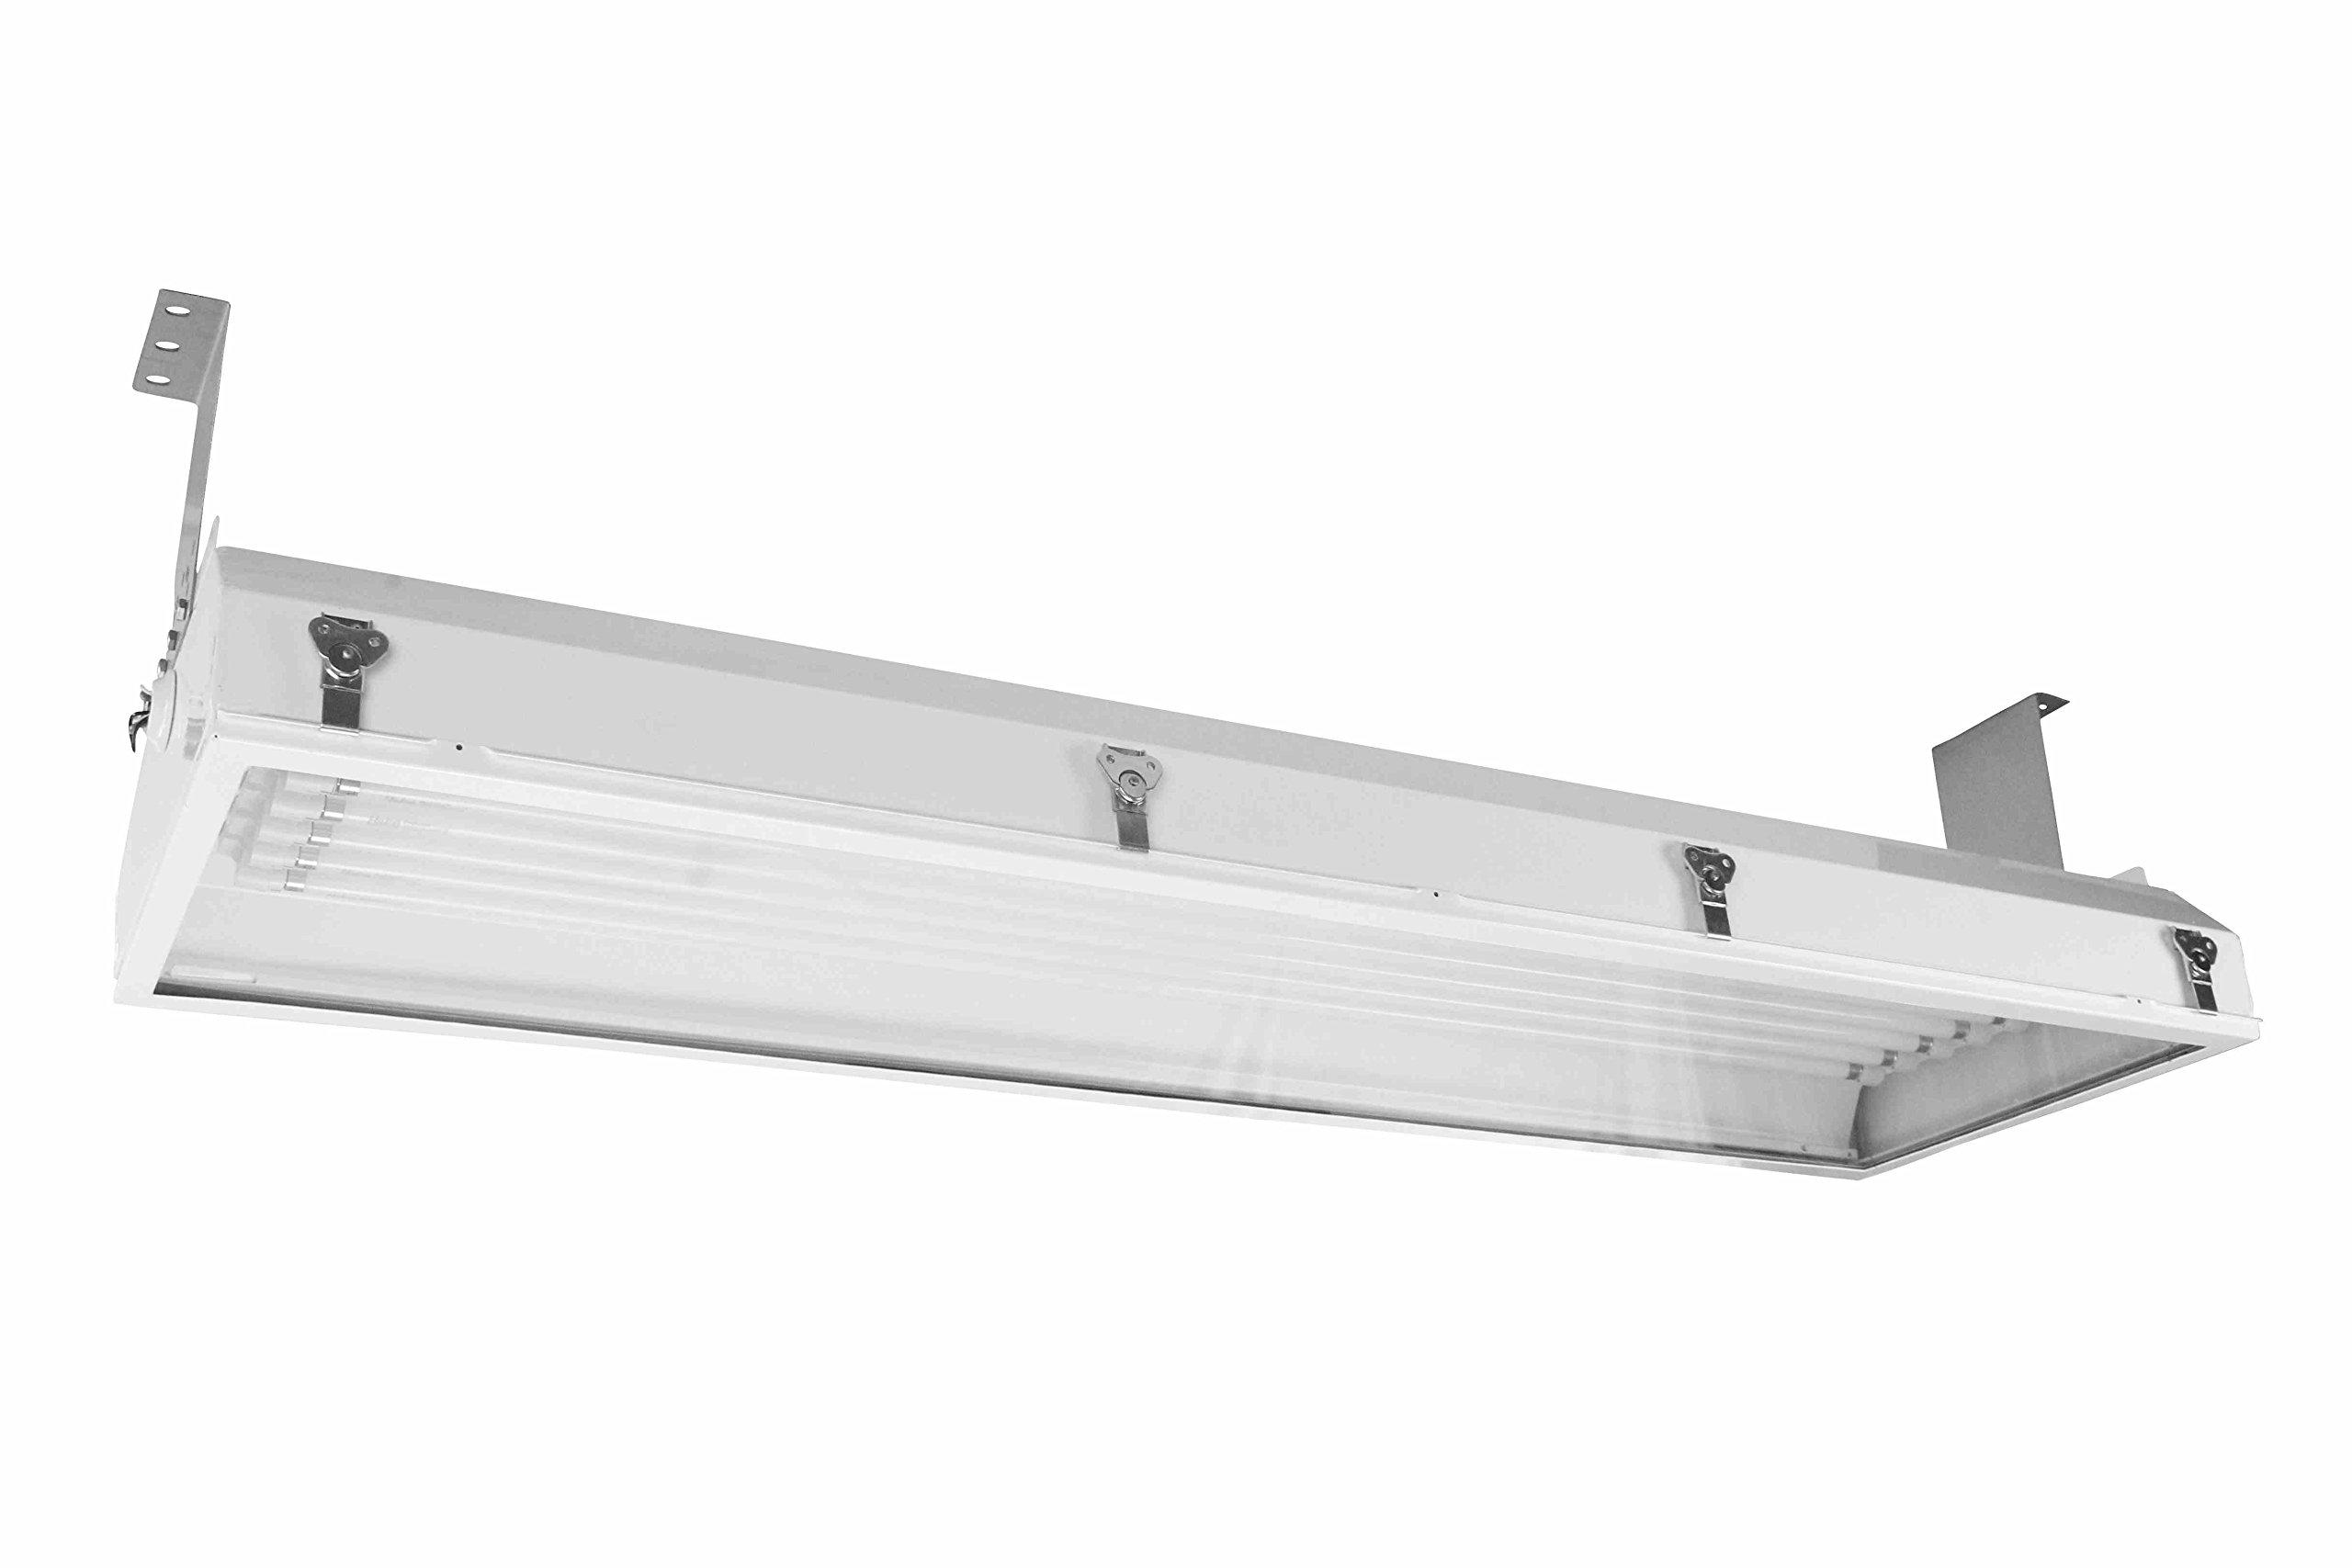 Hazardous Location Fluorescent Lighting Fixture - 4' 6 Lamp - T8 - Class I Div 2 & Class II Div 2(-Cable)